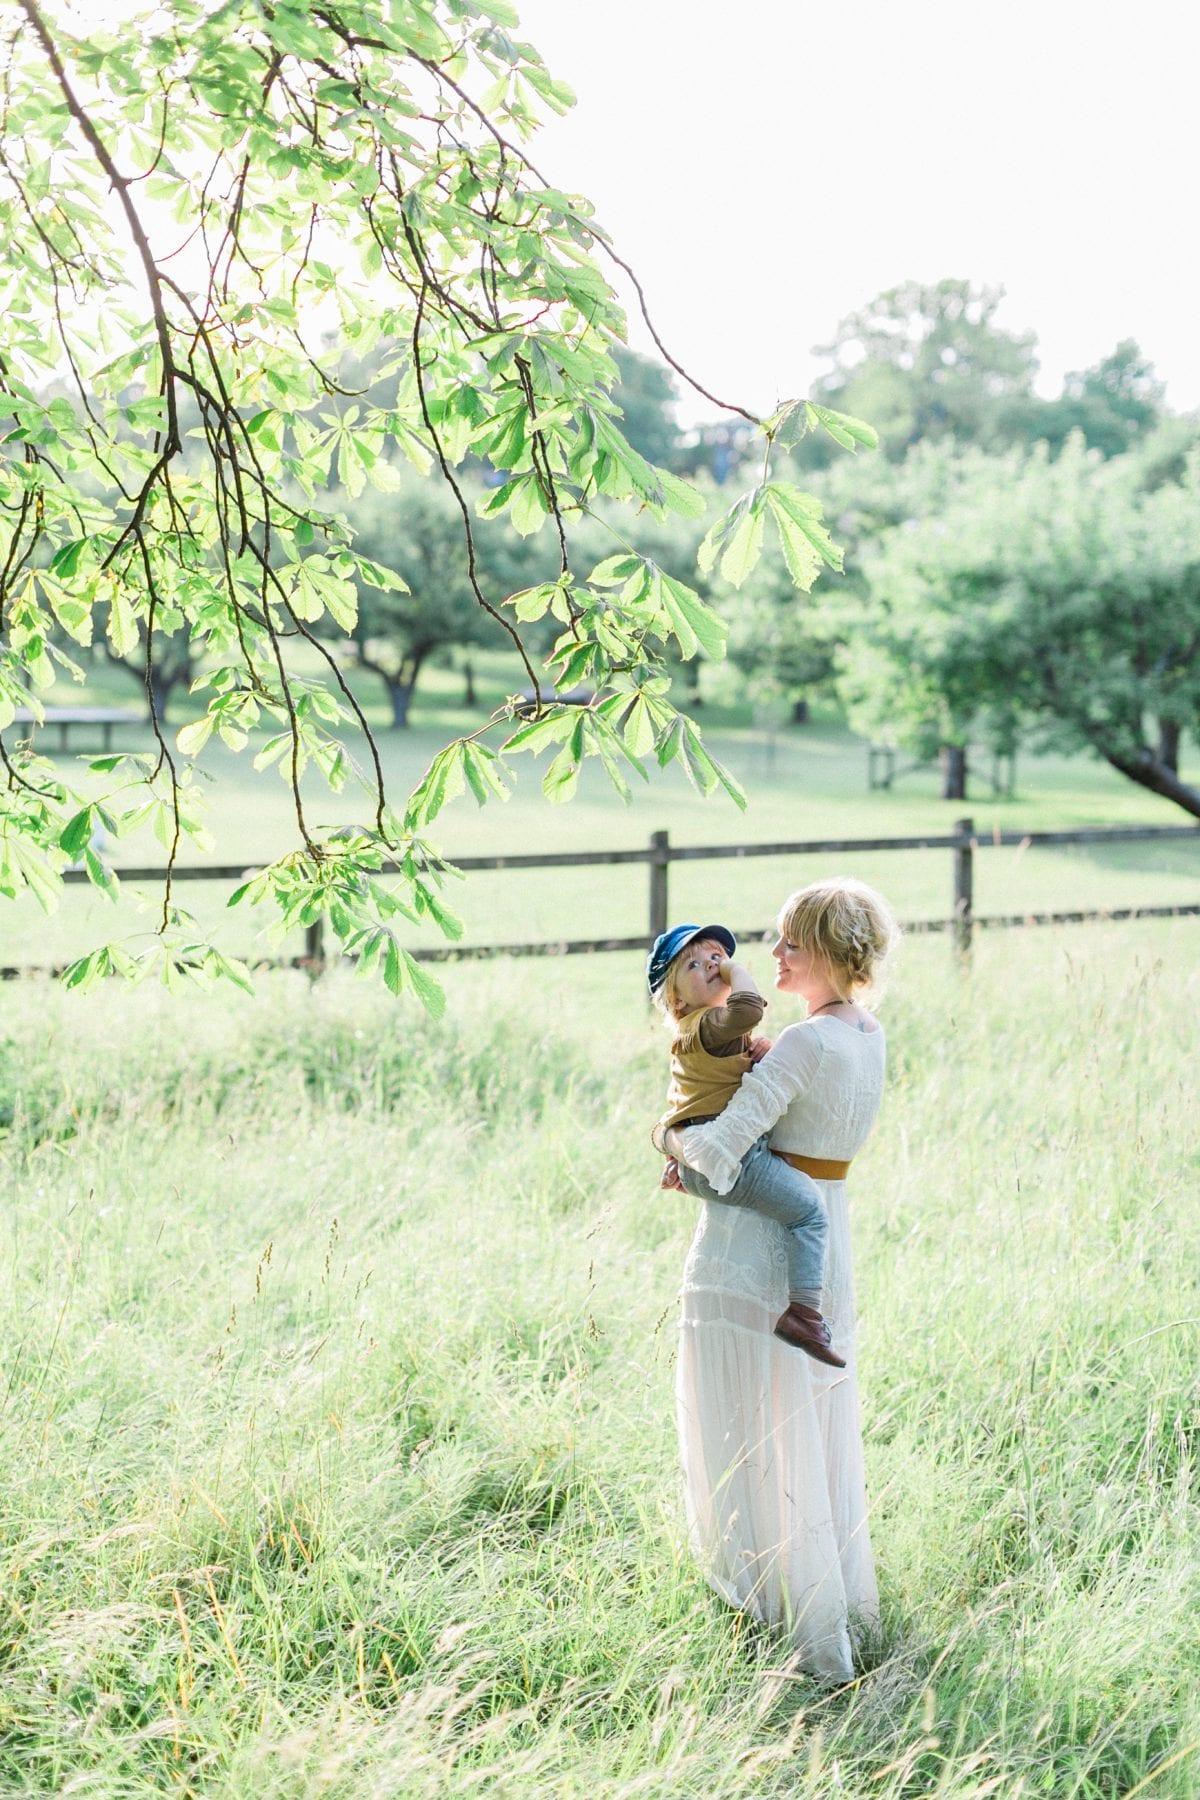 elin_bandmann_photography_wedding_photographer_sweden-15